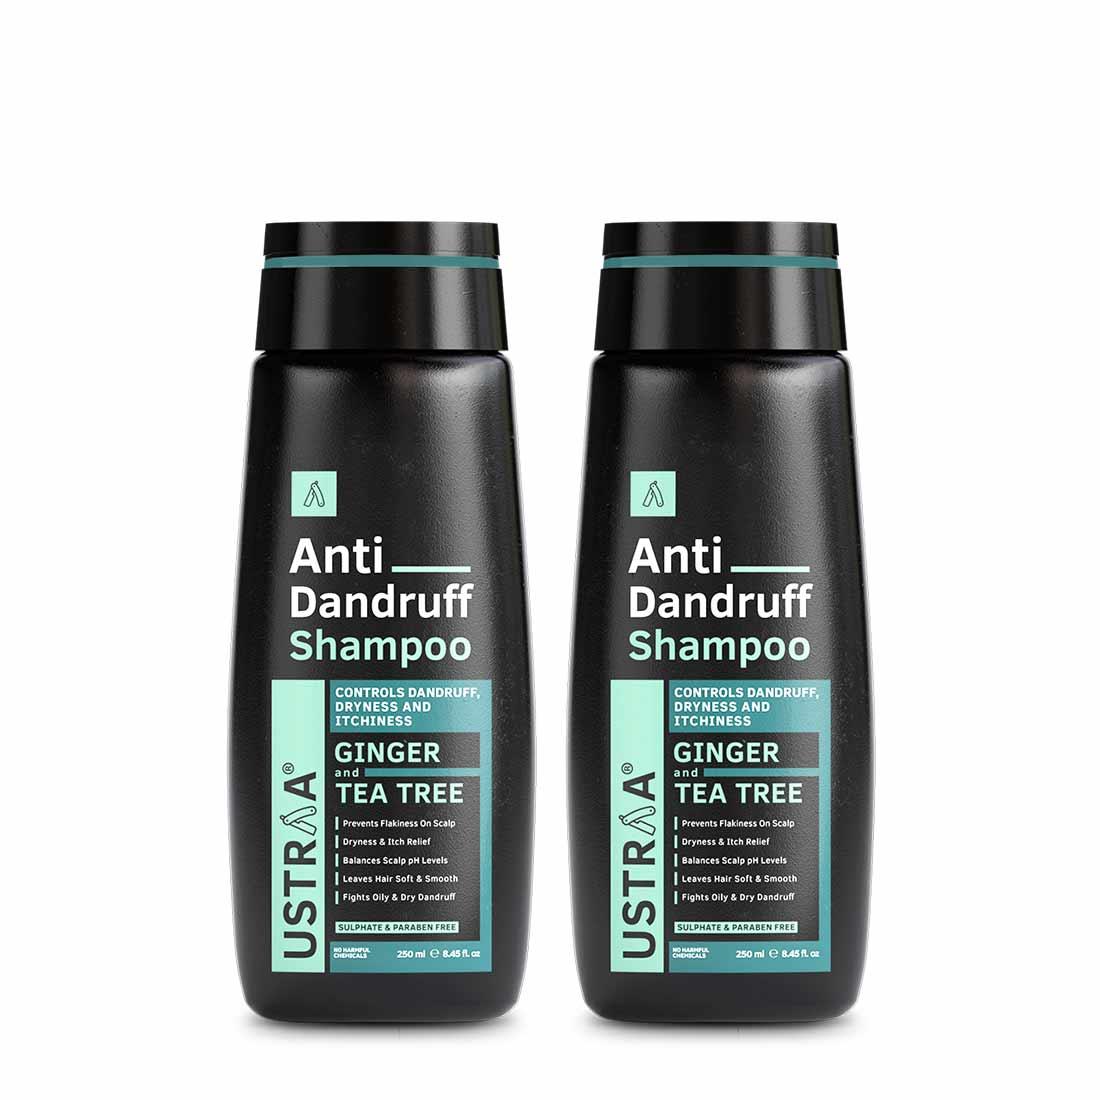 Anti Dandruff Hair Shampoo - 250 ml- Set of 2